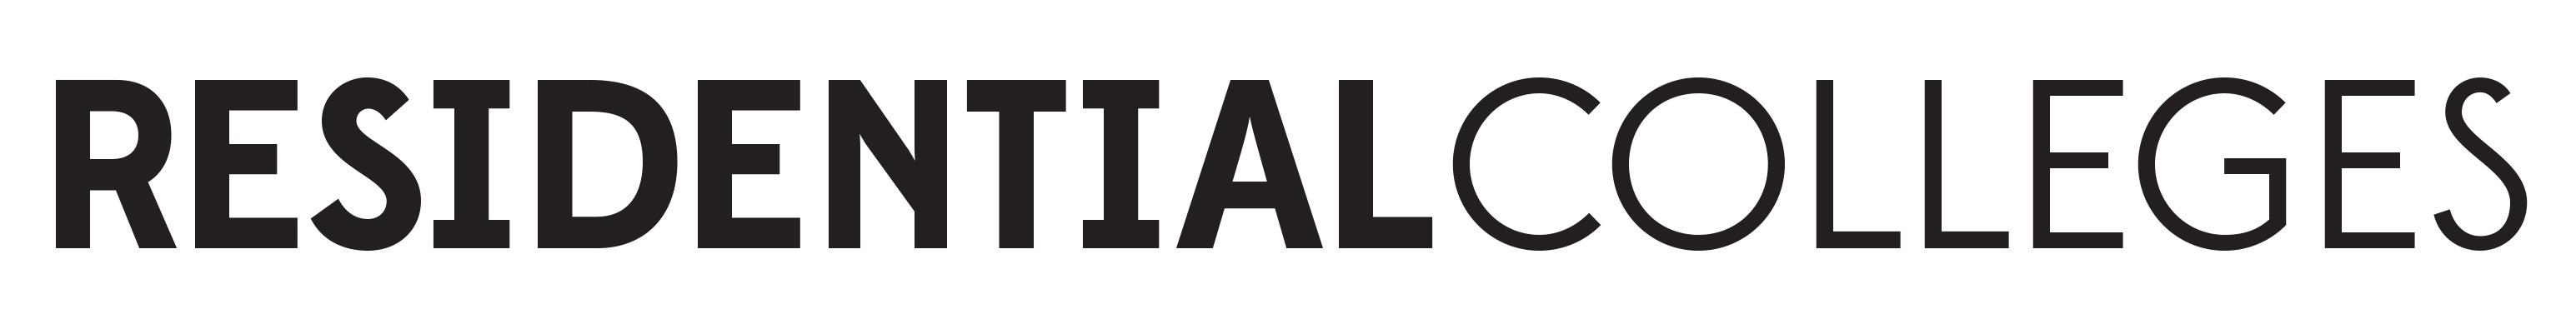 Residential Colleges wordmark